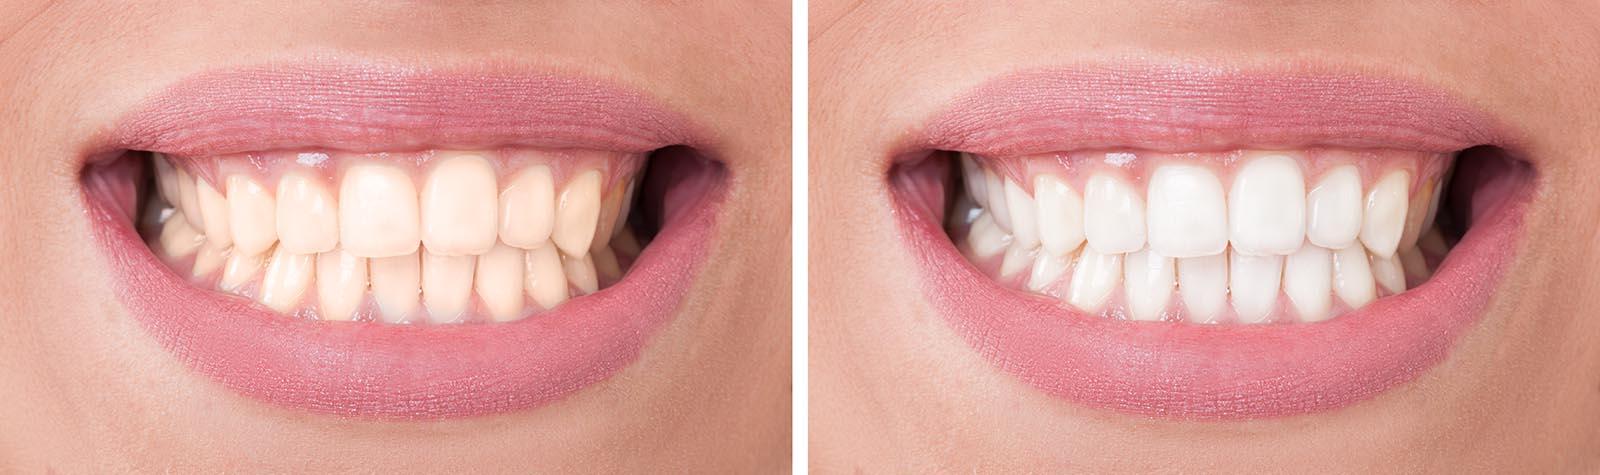 teeth whitening dentist gold coast